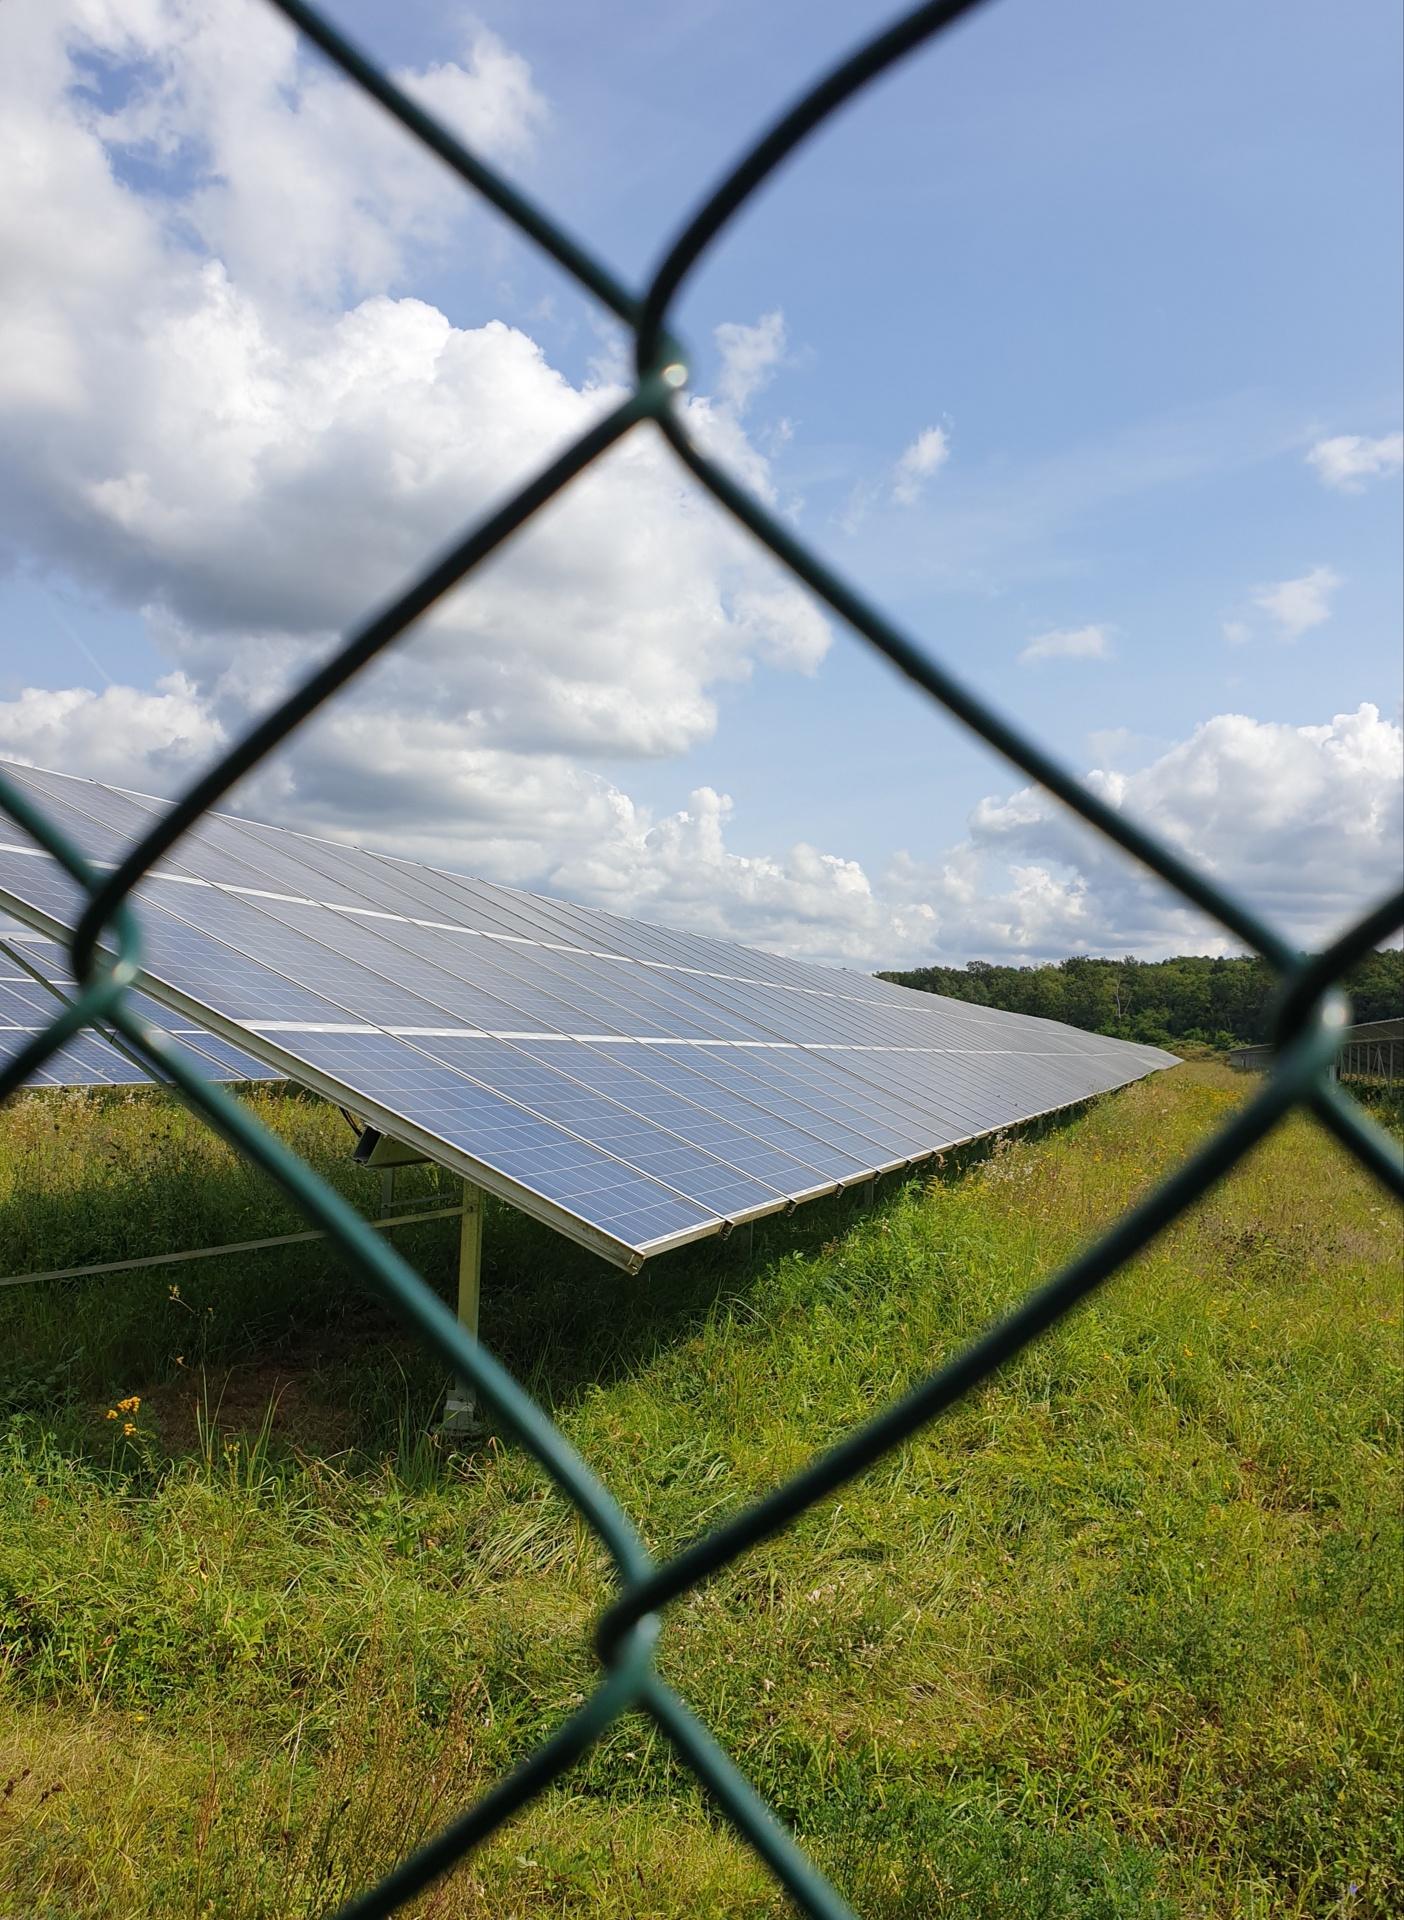 Solarfarm anstatt Kohle